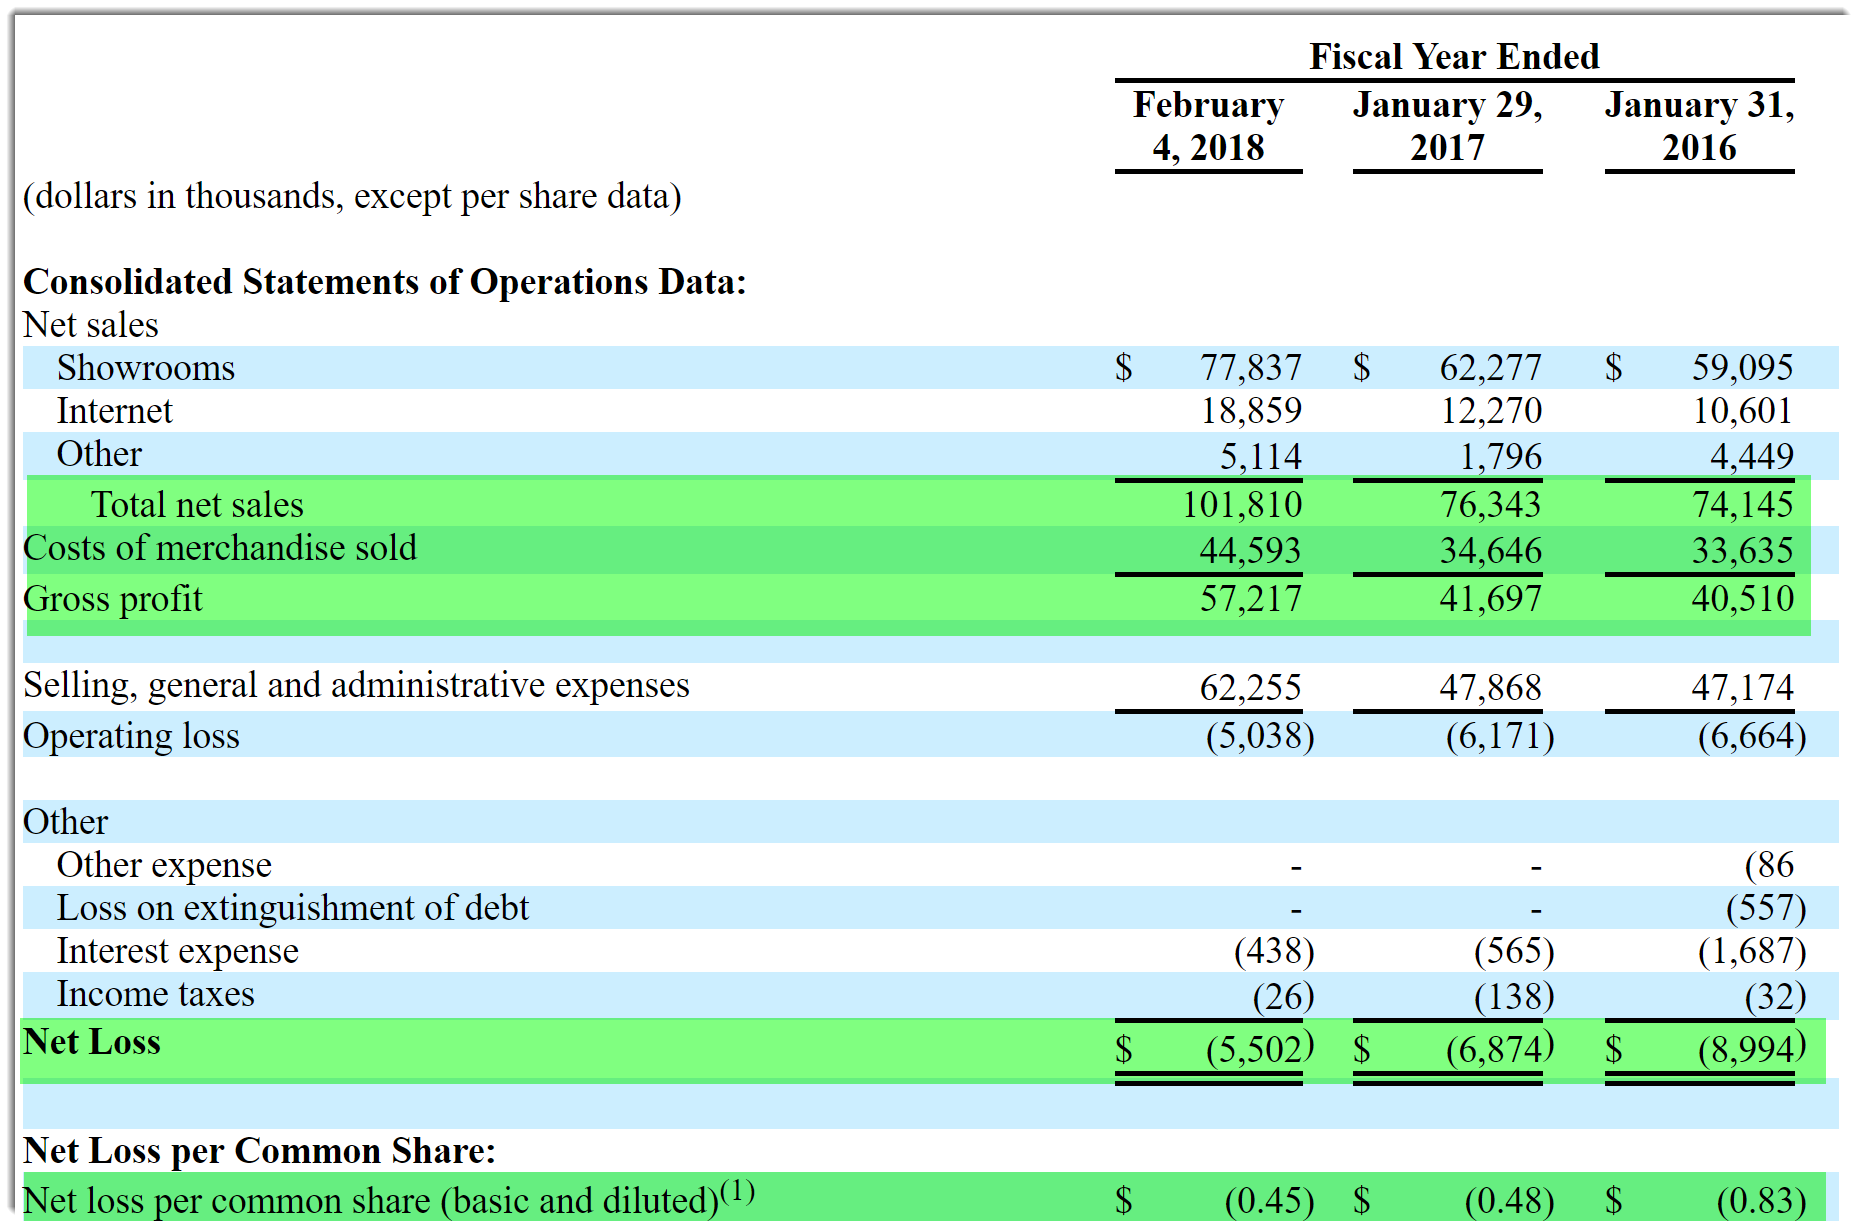 Lovesac Aims To Raise $46 Million In IPO